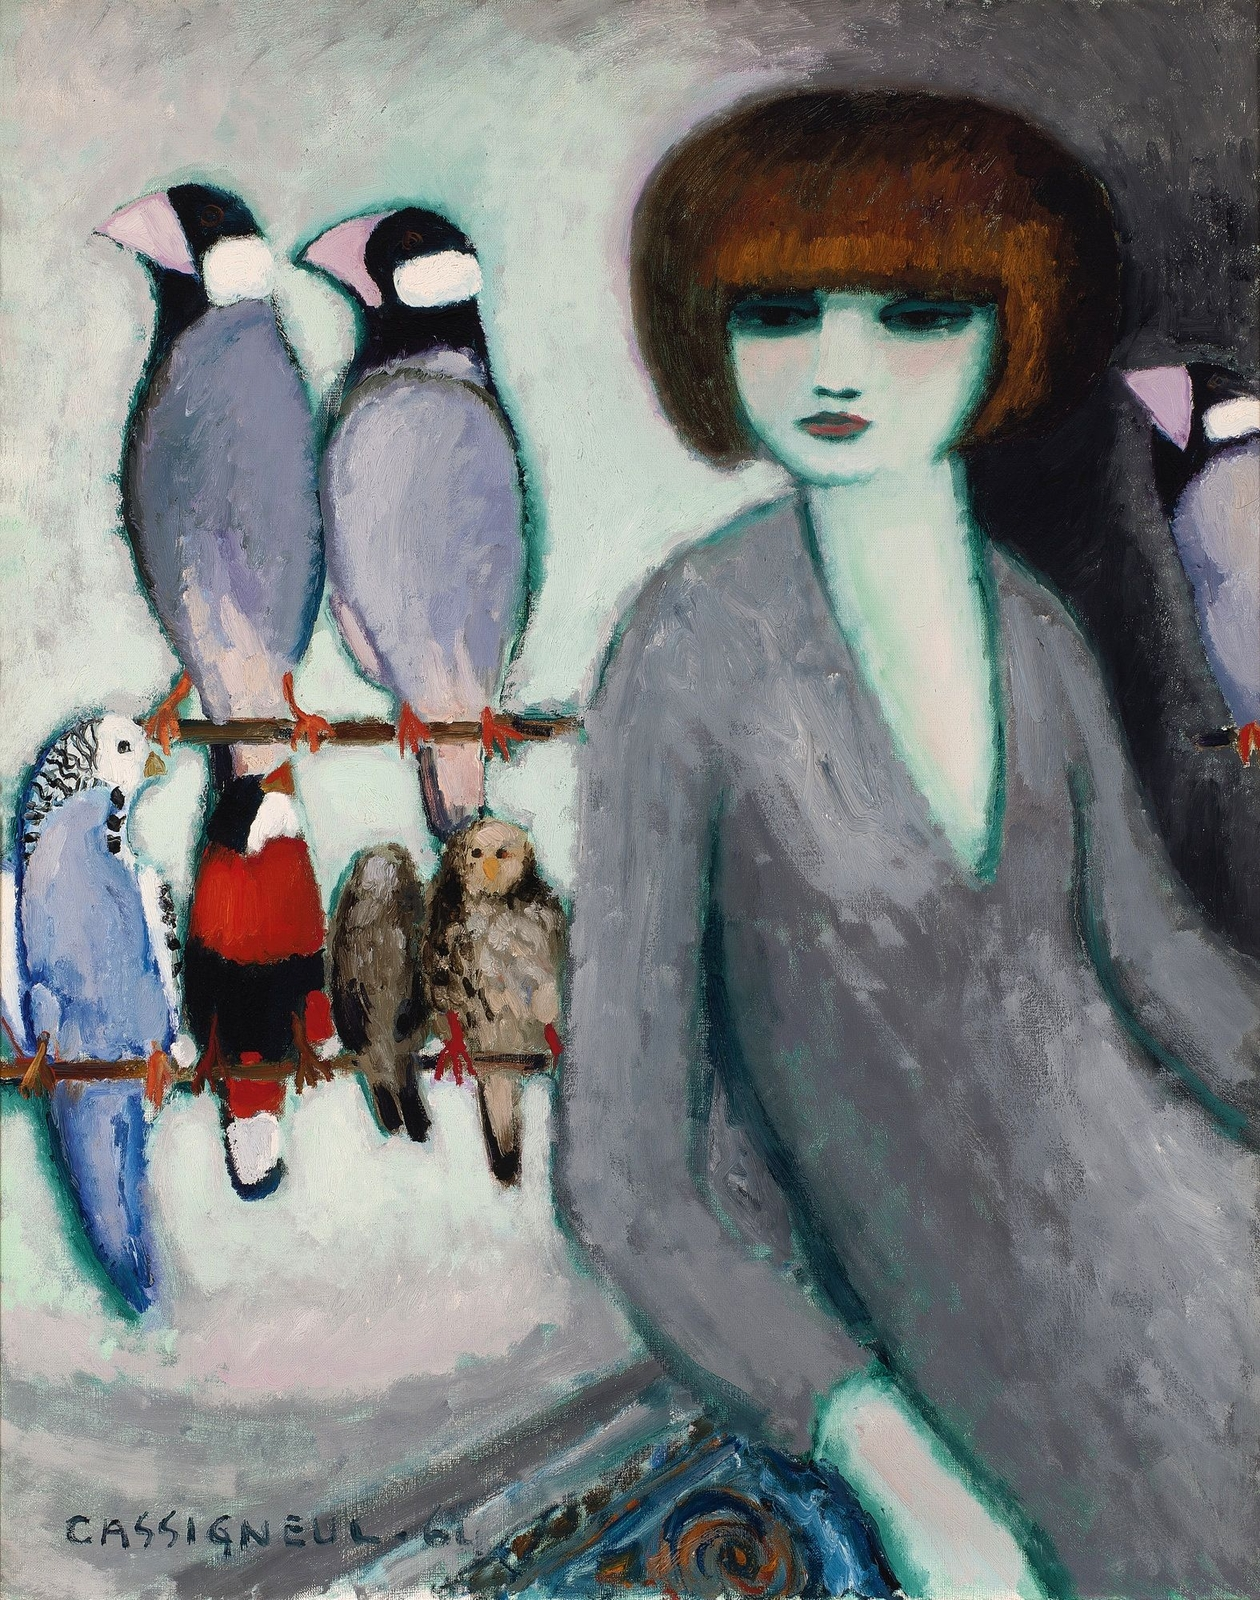 1_1962_Дама с попугаями (Elegante Aux Perroquets)_92.2 х 73_х.,м._Частное собрание.jpg